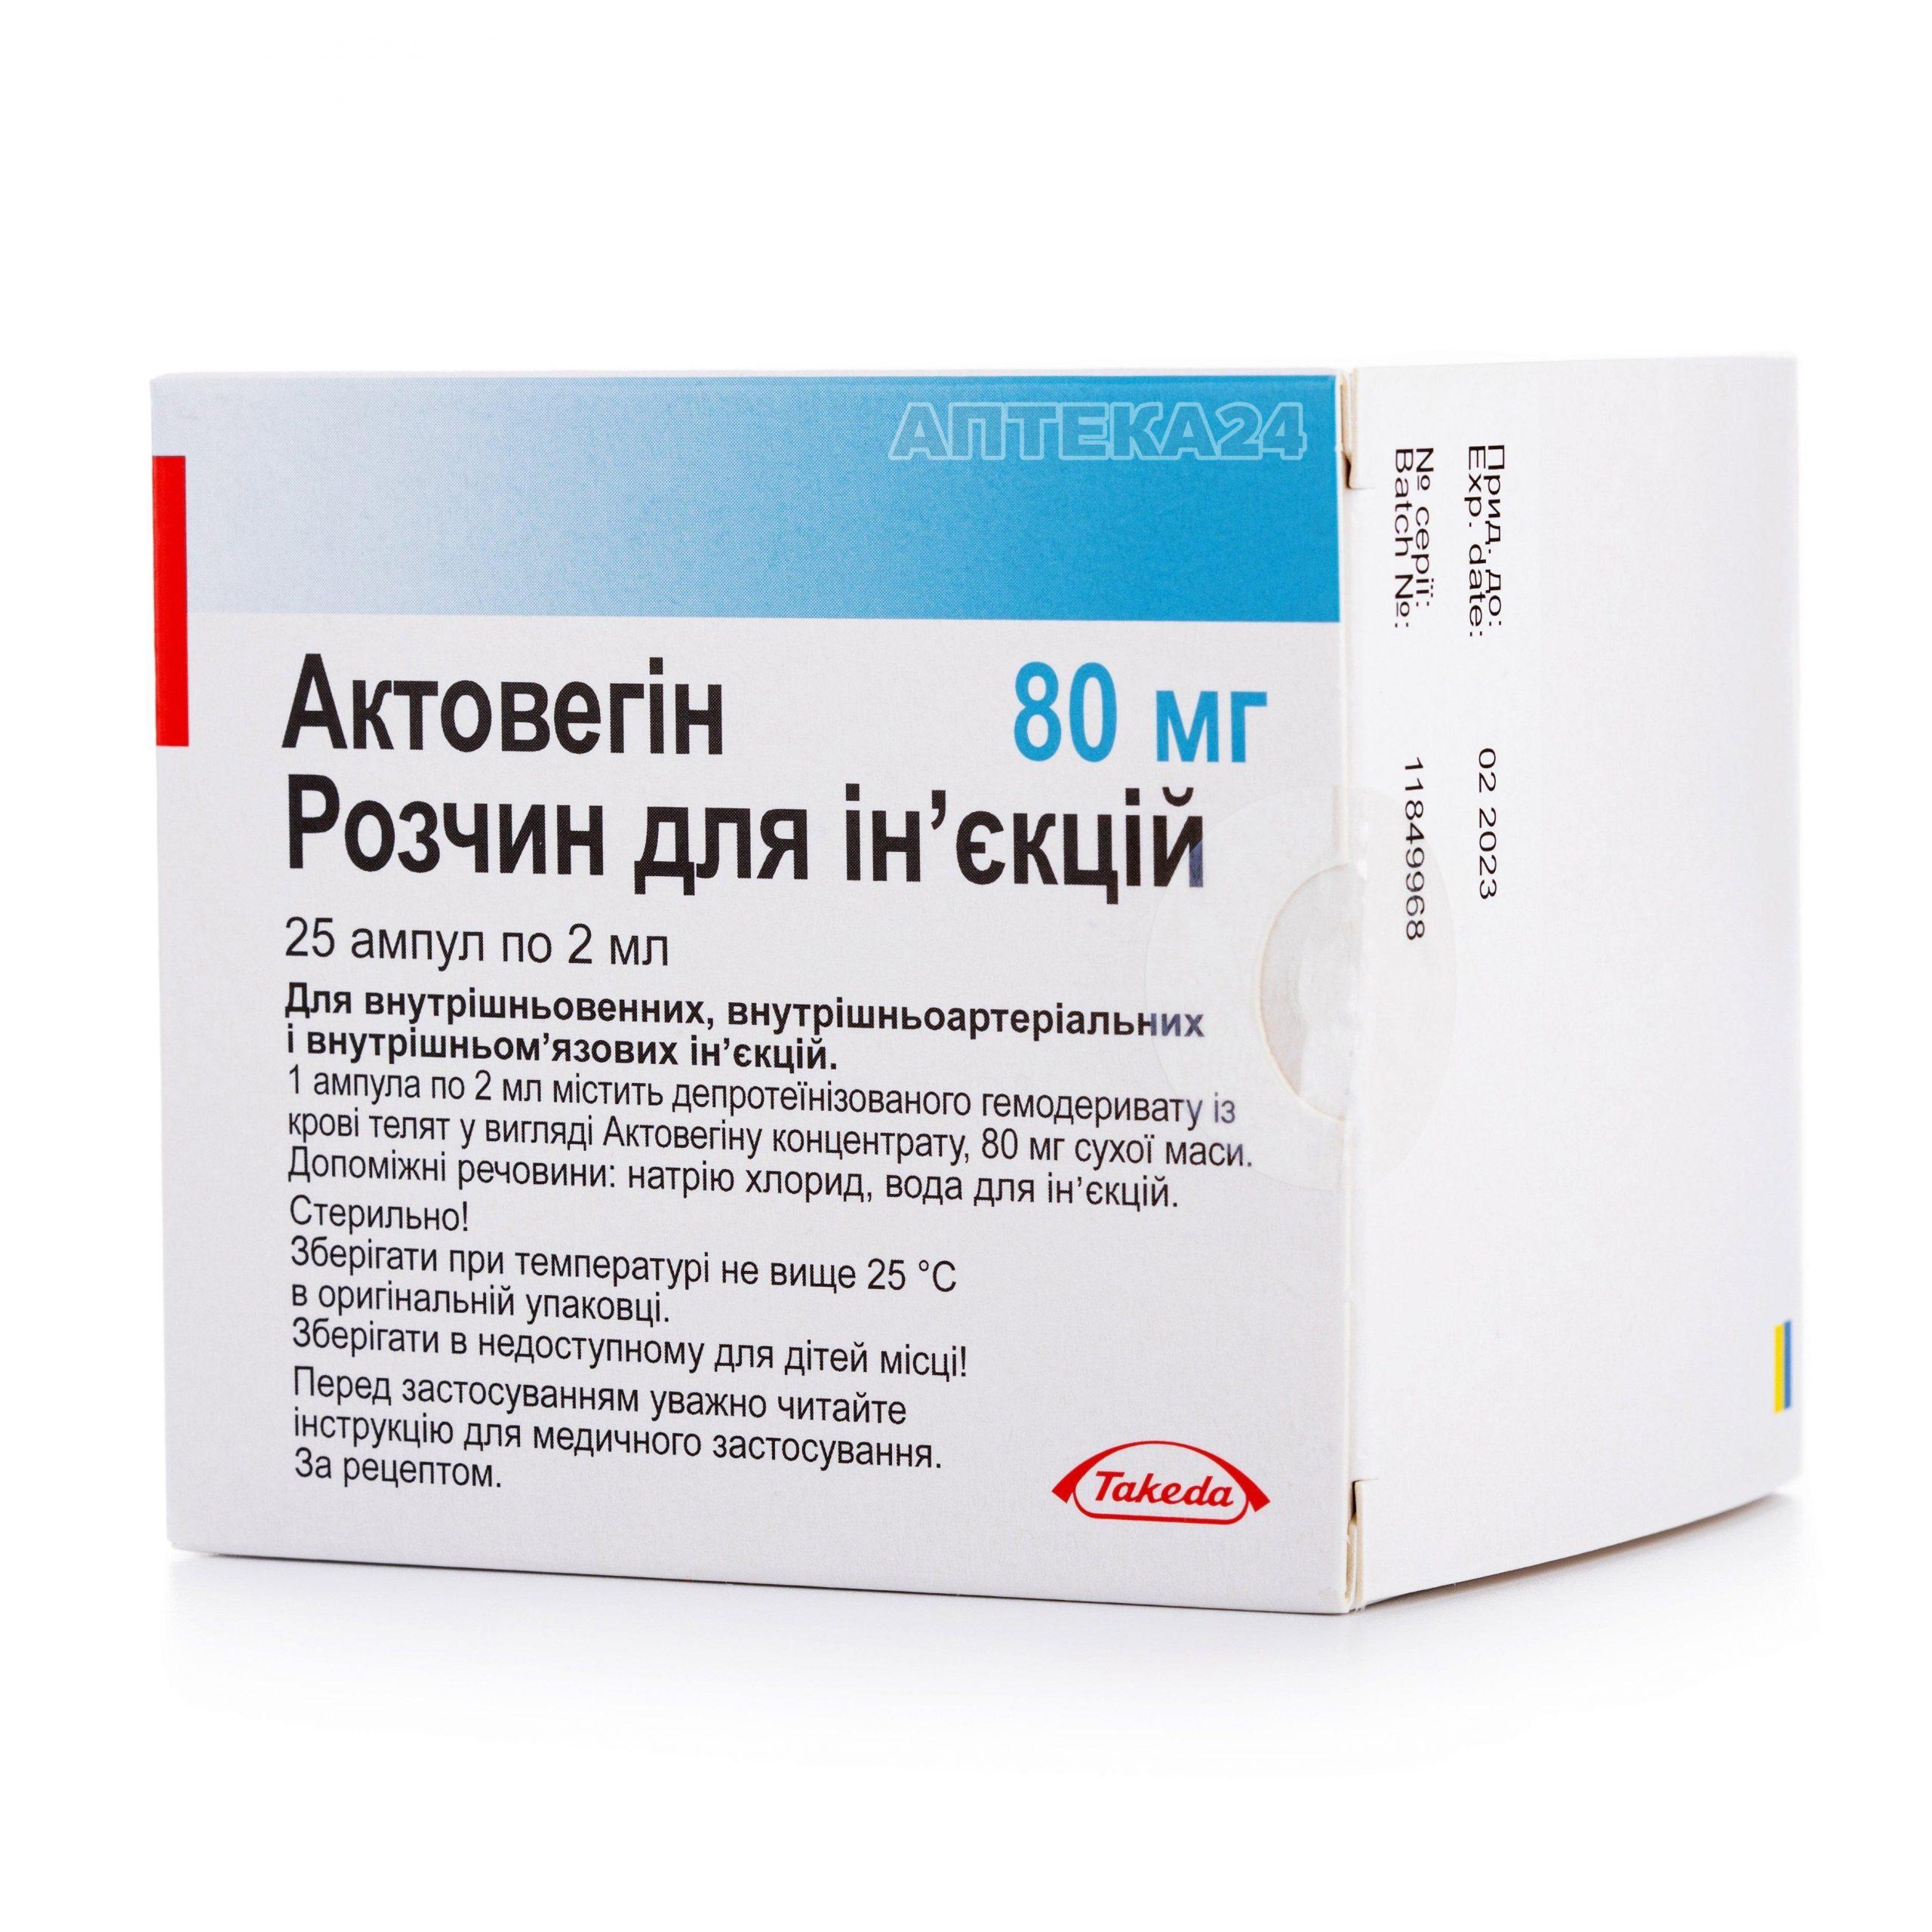 Актовегин 80 мг 2 мл №25 раствор для инъекций_6005d207515ca.jpeg